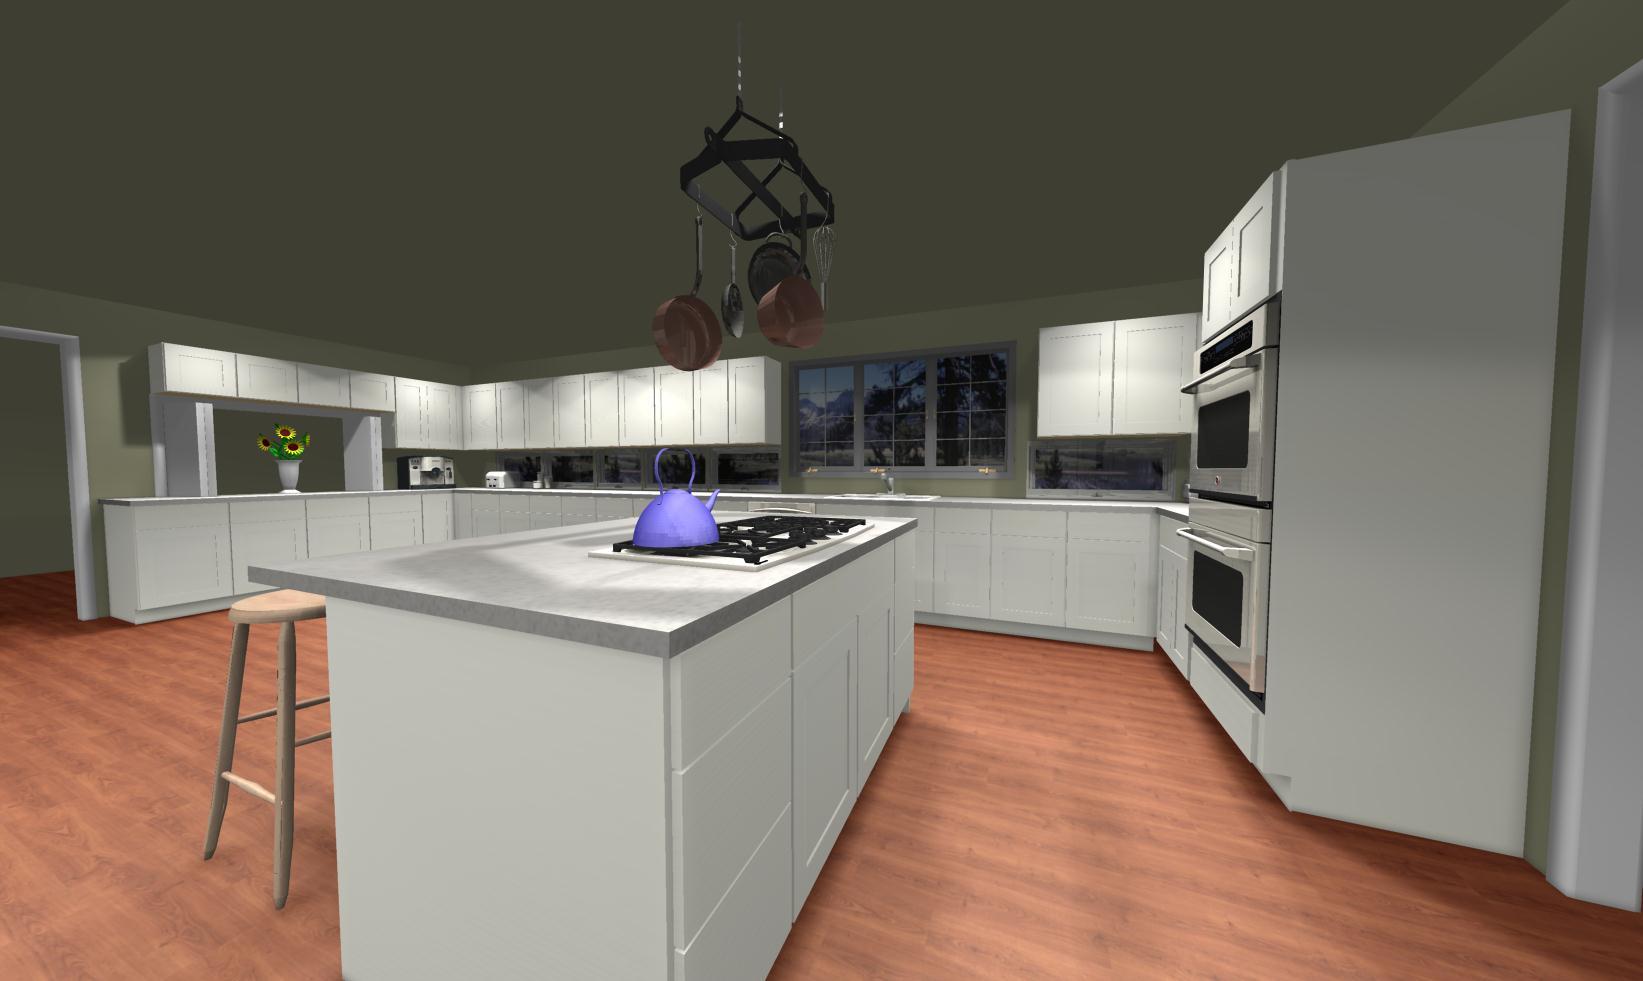 Famous Kitchens Get The Look Bree Van De Kamp Desperate Housewives Tv Homes Edition Ikdo